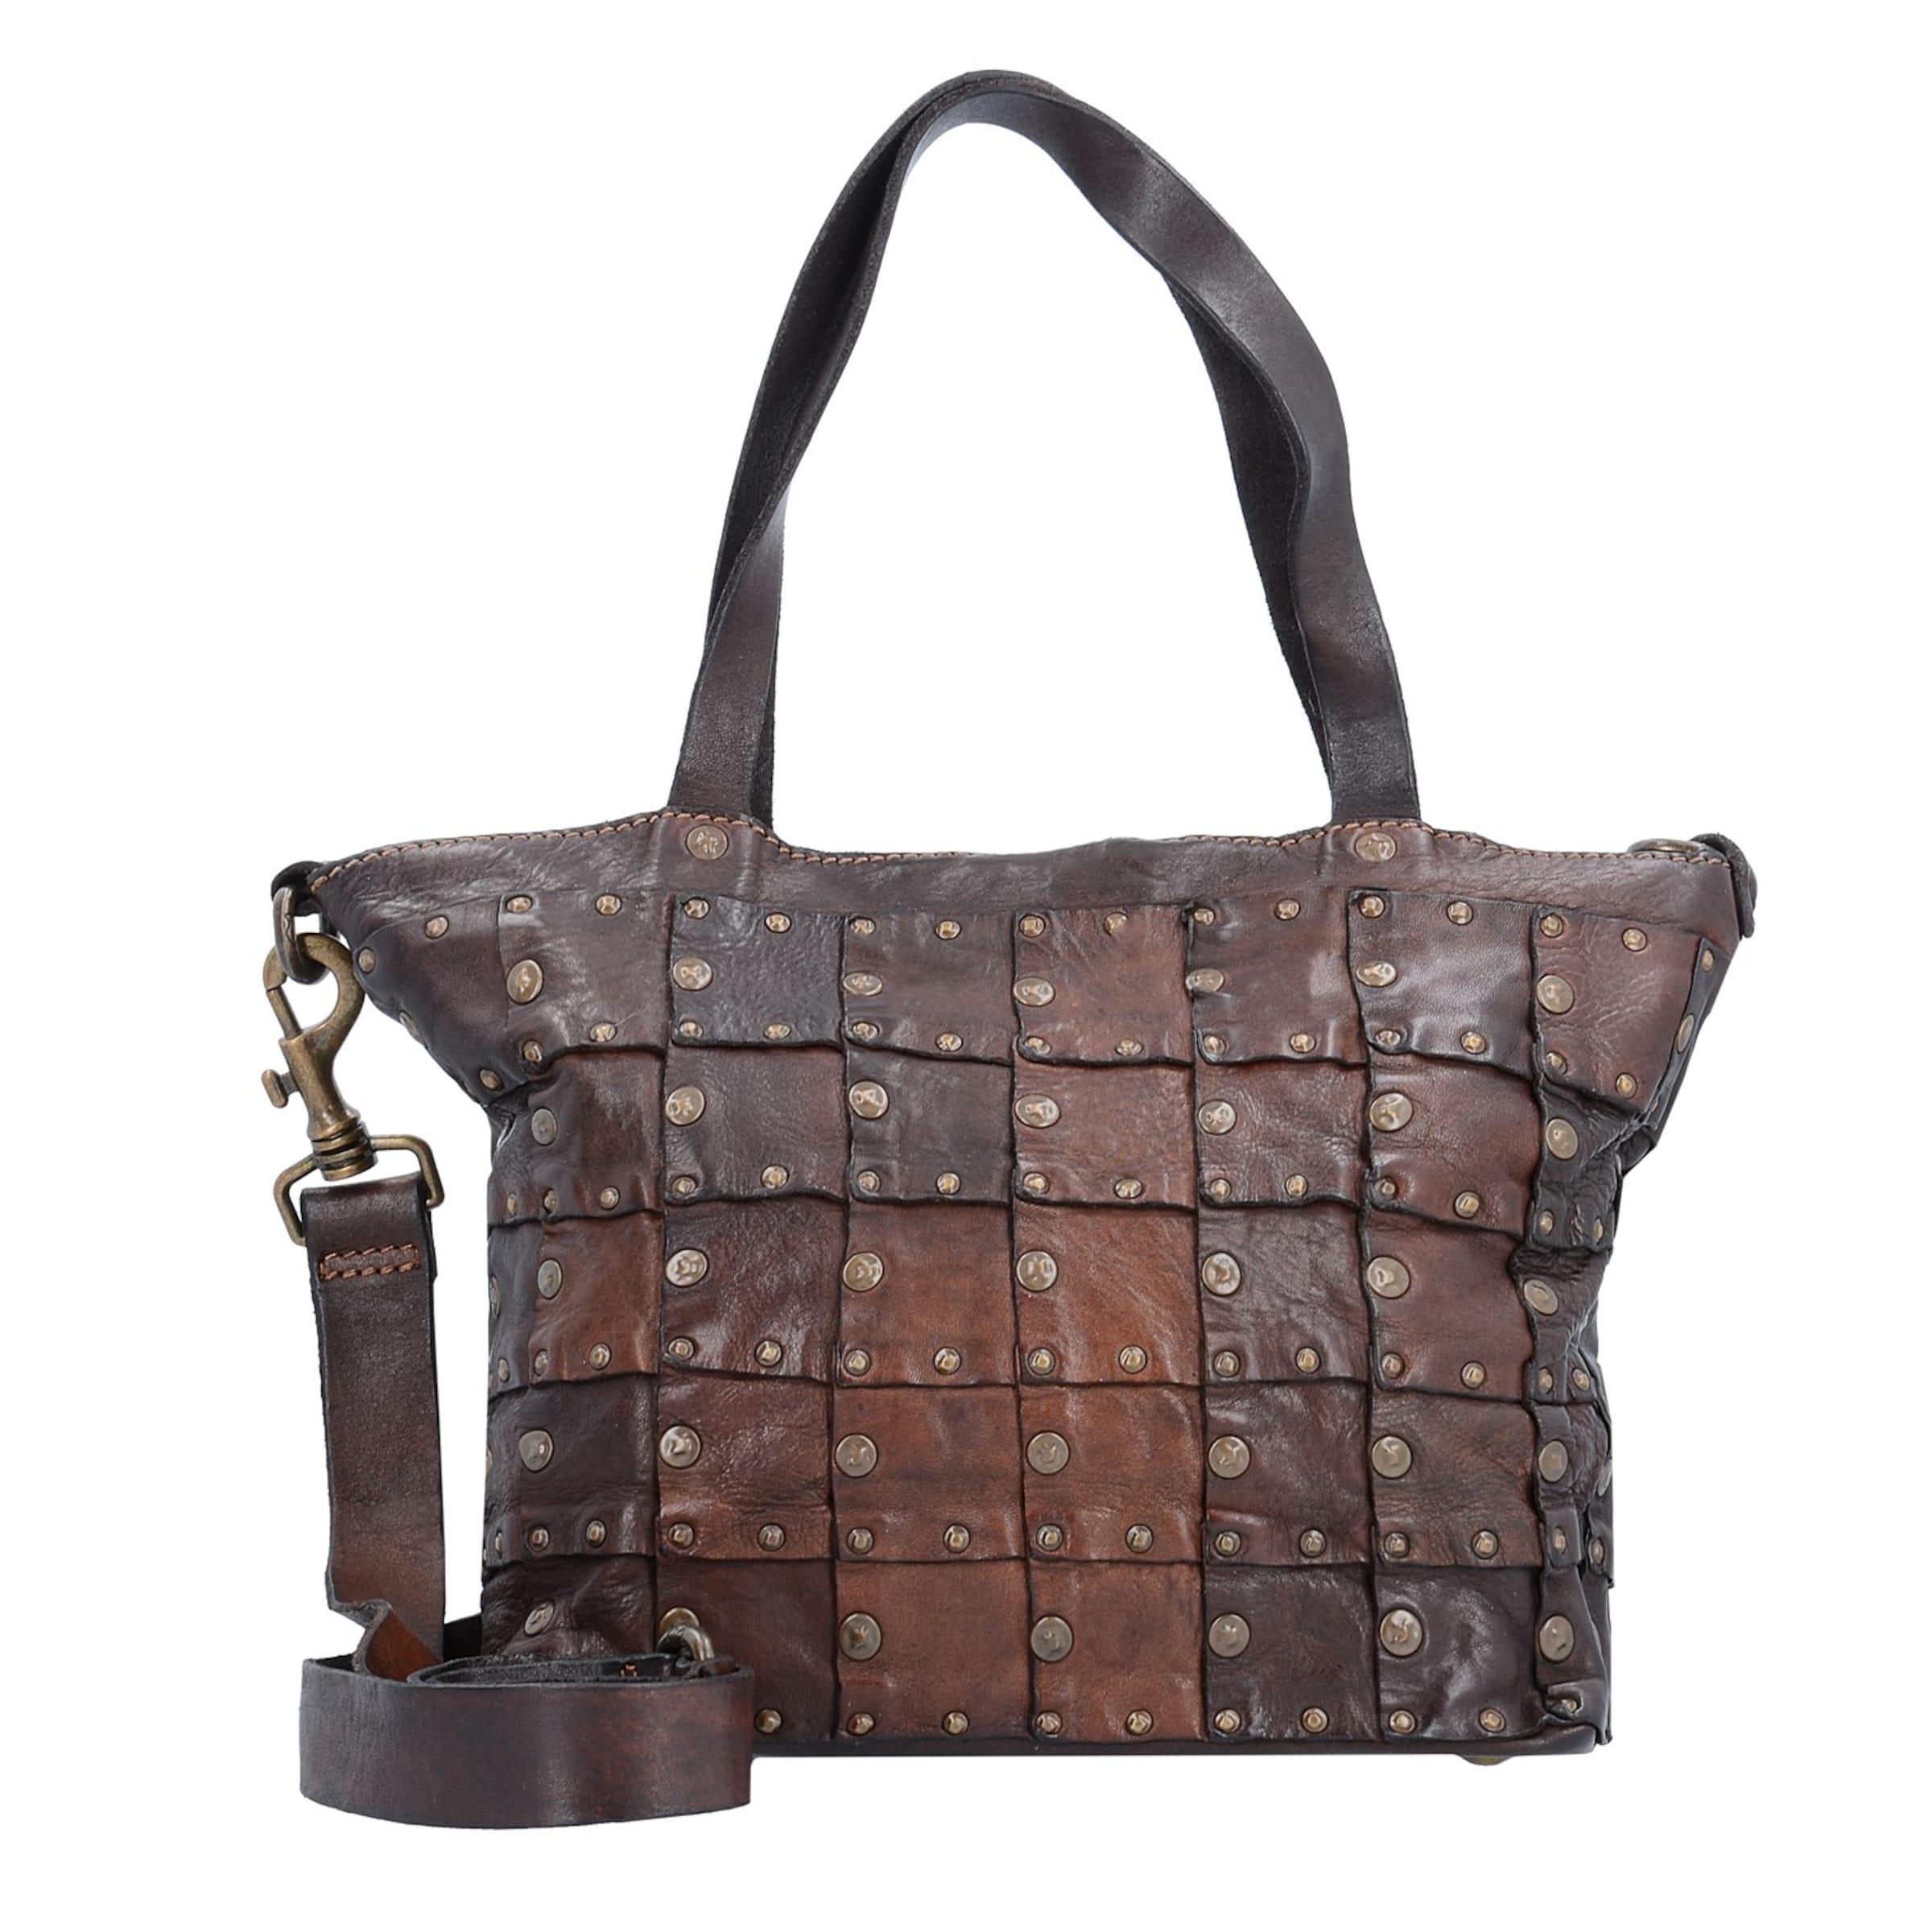 Online Shop Campomaggi Rivetti Vacch Handtasche Leder 26 cm Billig Verkauf 100% Garantiert Original zeTH9B